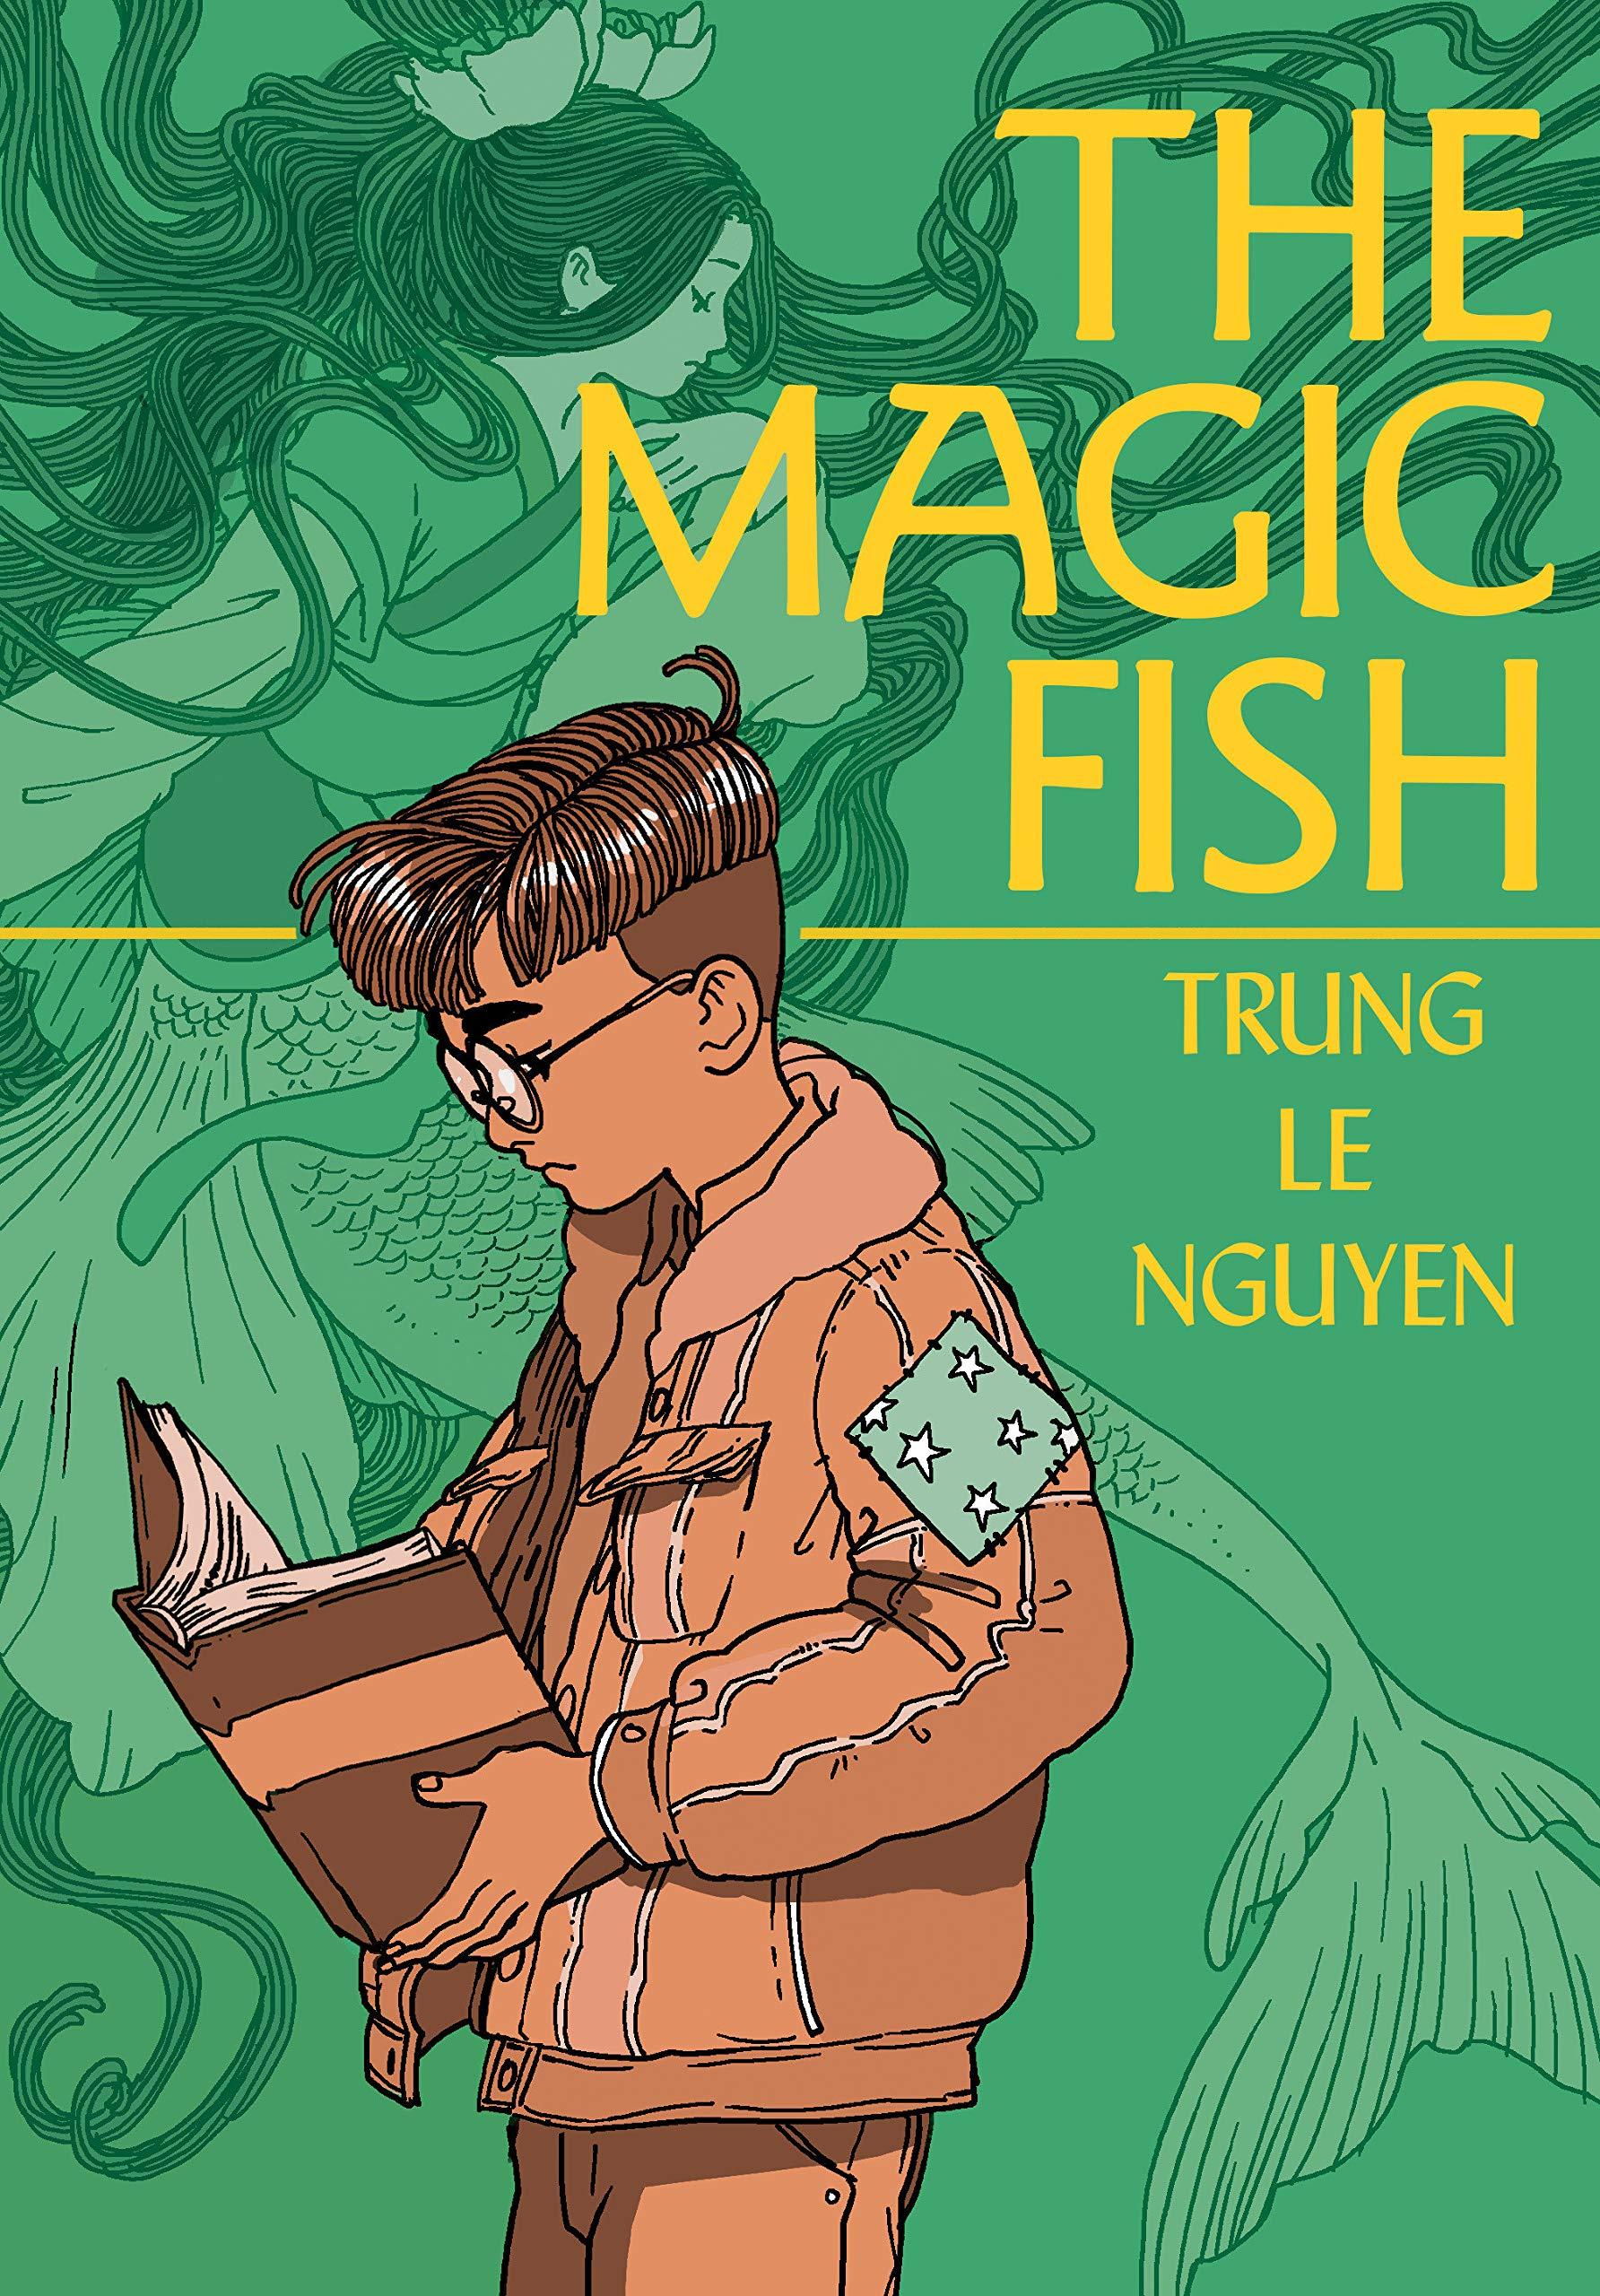 Amazon.com: The Magic Fish (9781984851598): Nguyen, Trung Le: Books